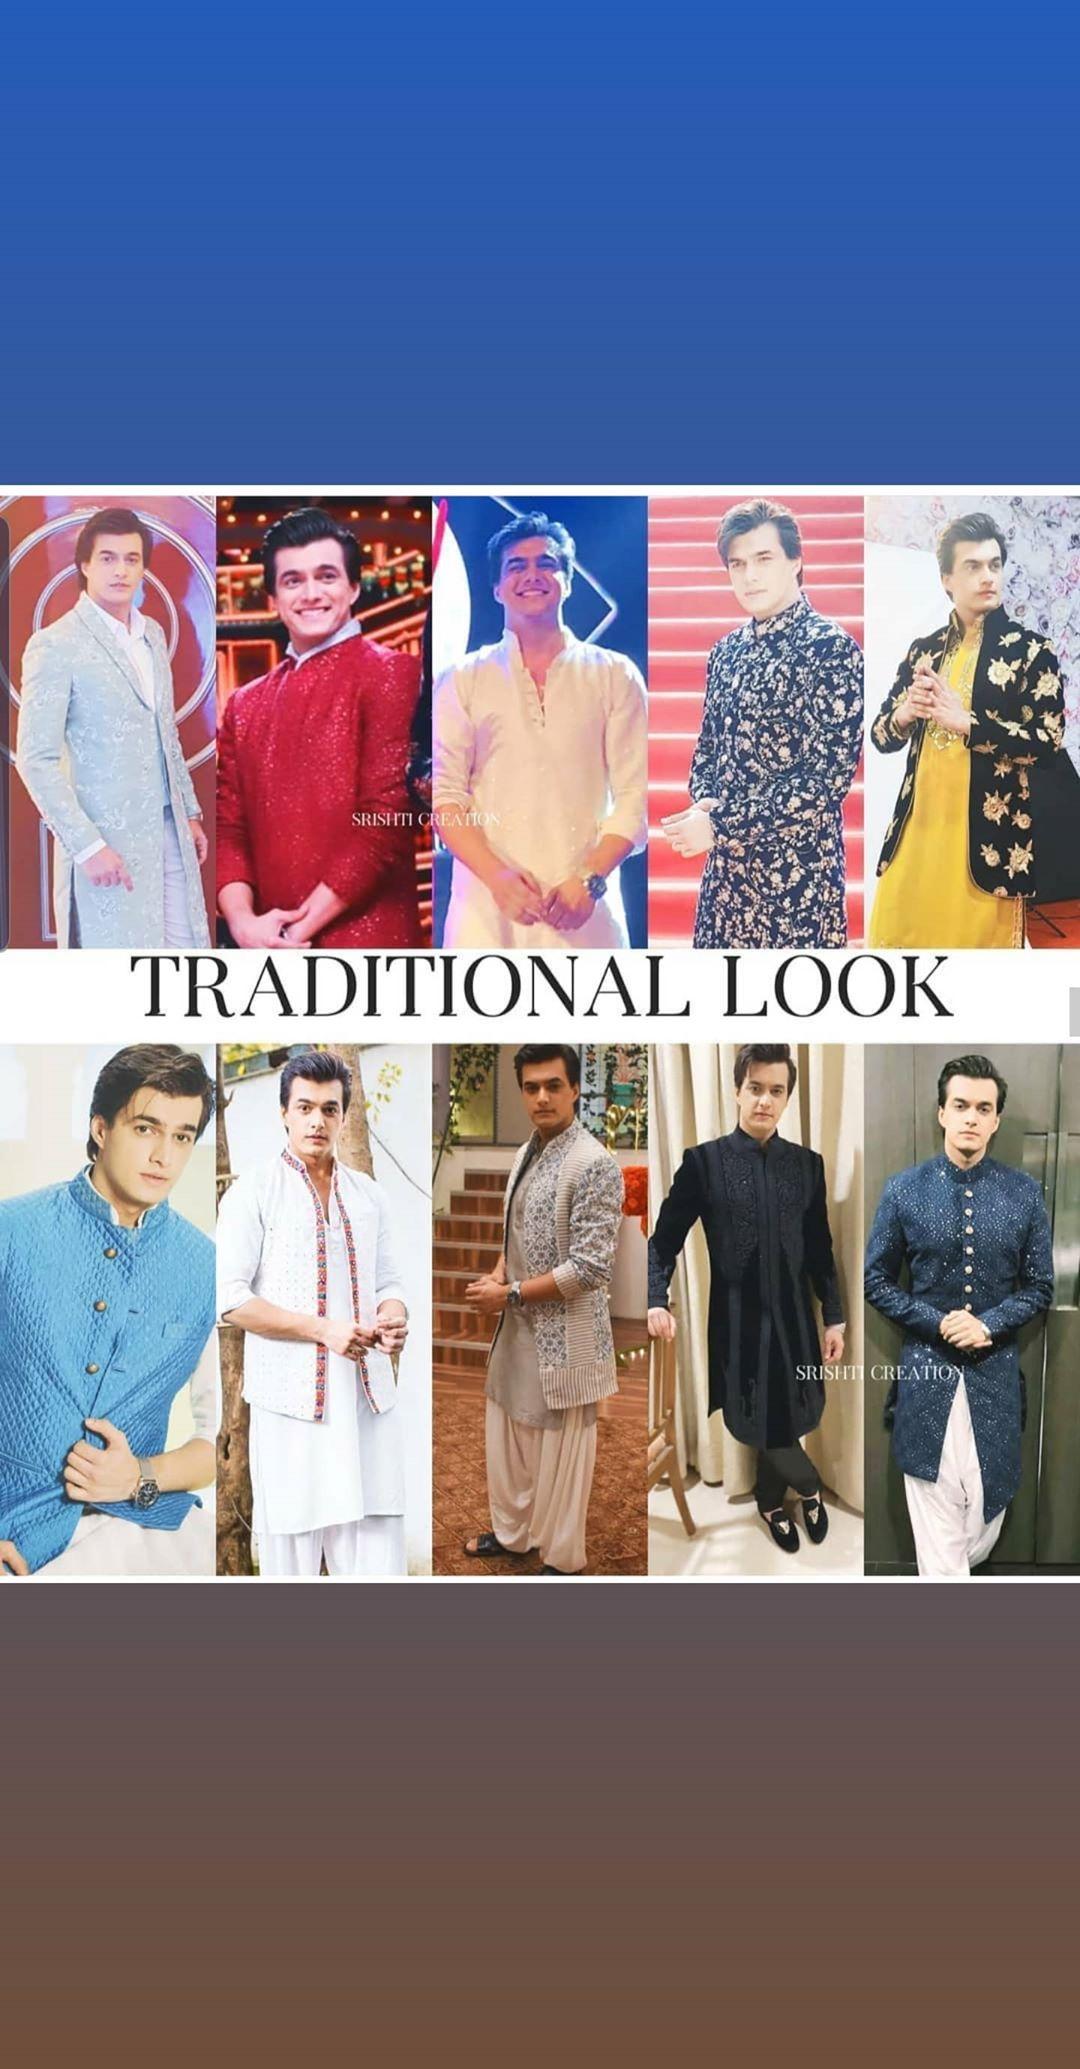 Yeh Rishta Kya Kehlata Hai's Mohsin Khan shares picture in traditional looks, fans go crazy